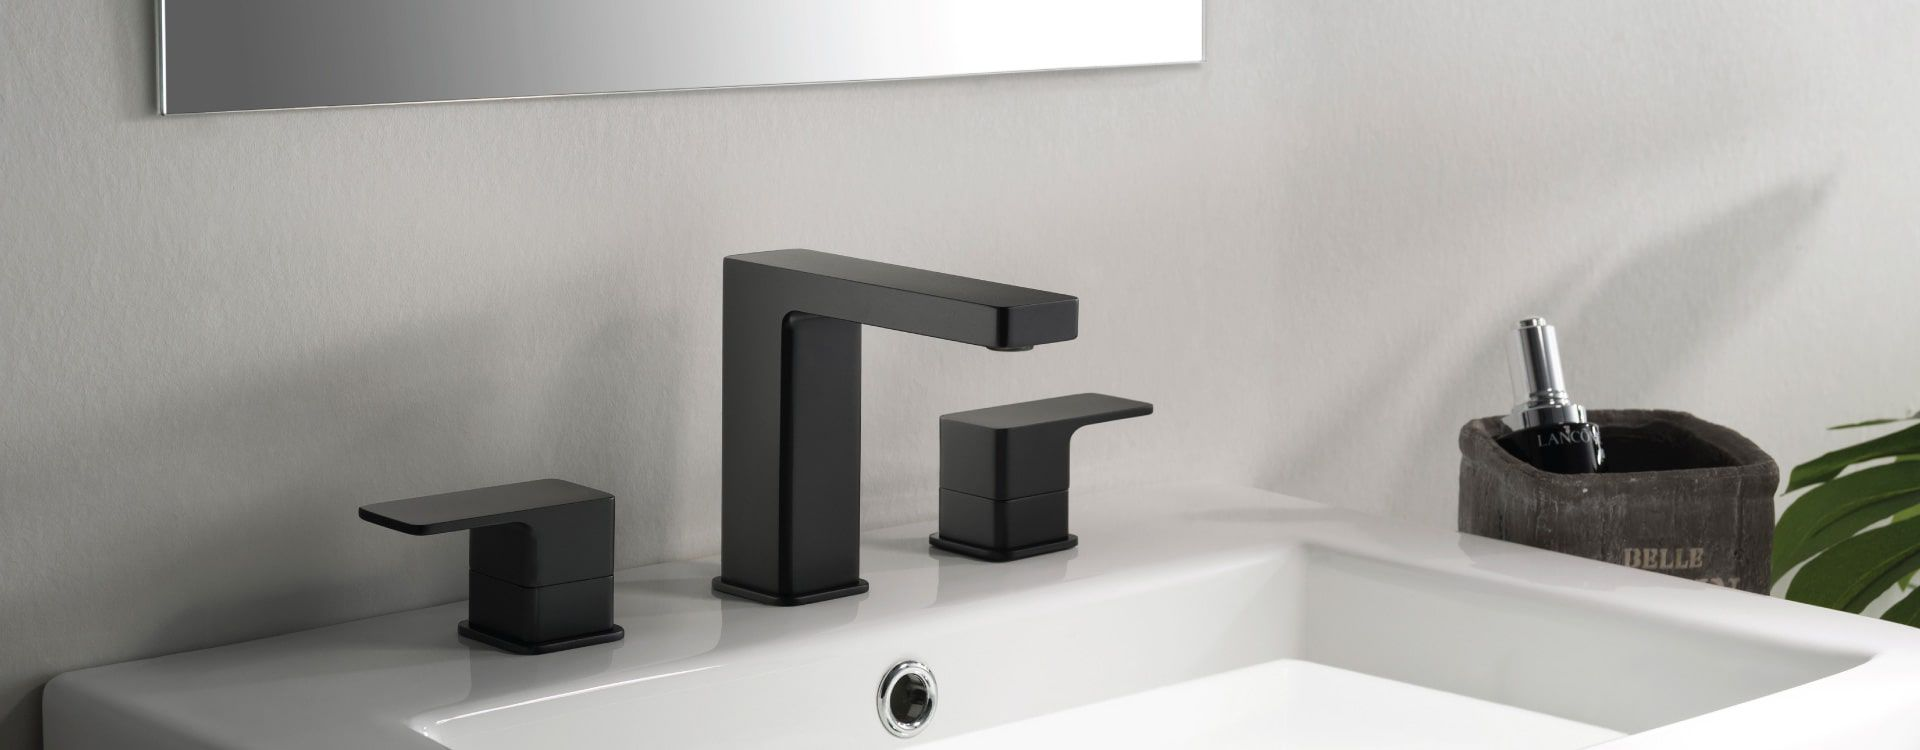 RM Living Cincinnati Modern Interior Design Bathroom Faucet by Isenberg Isenberg7